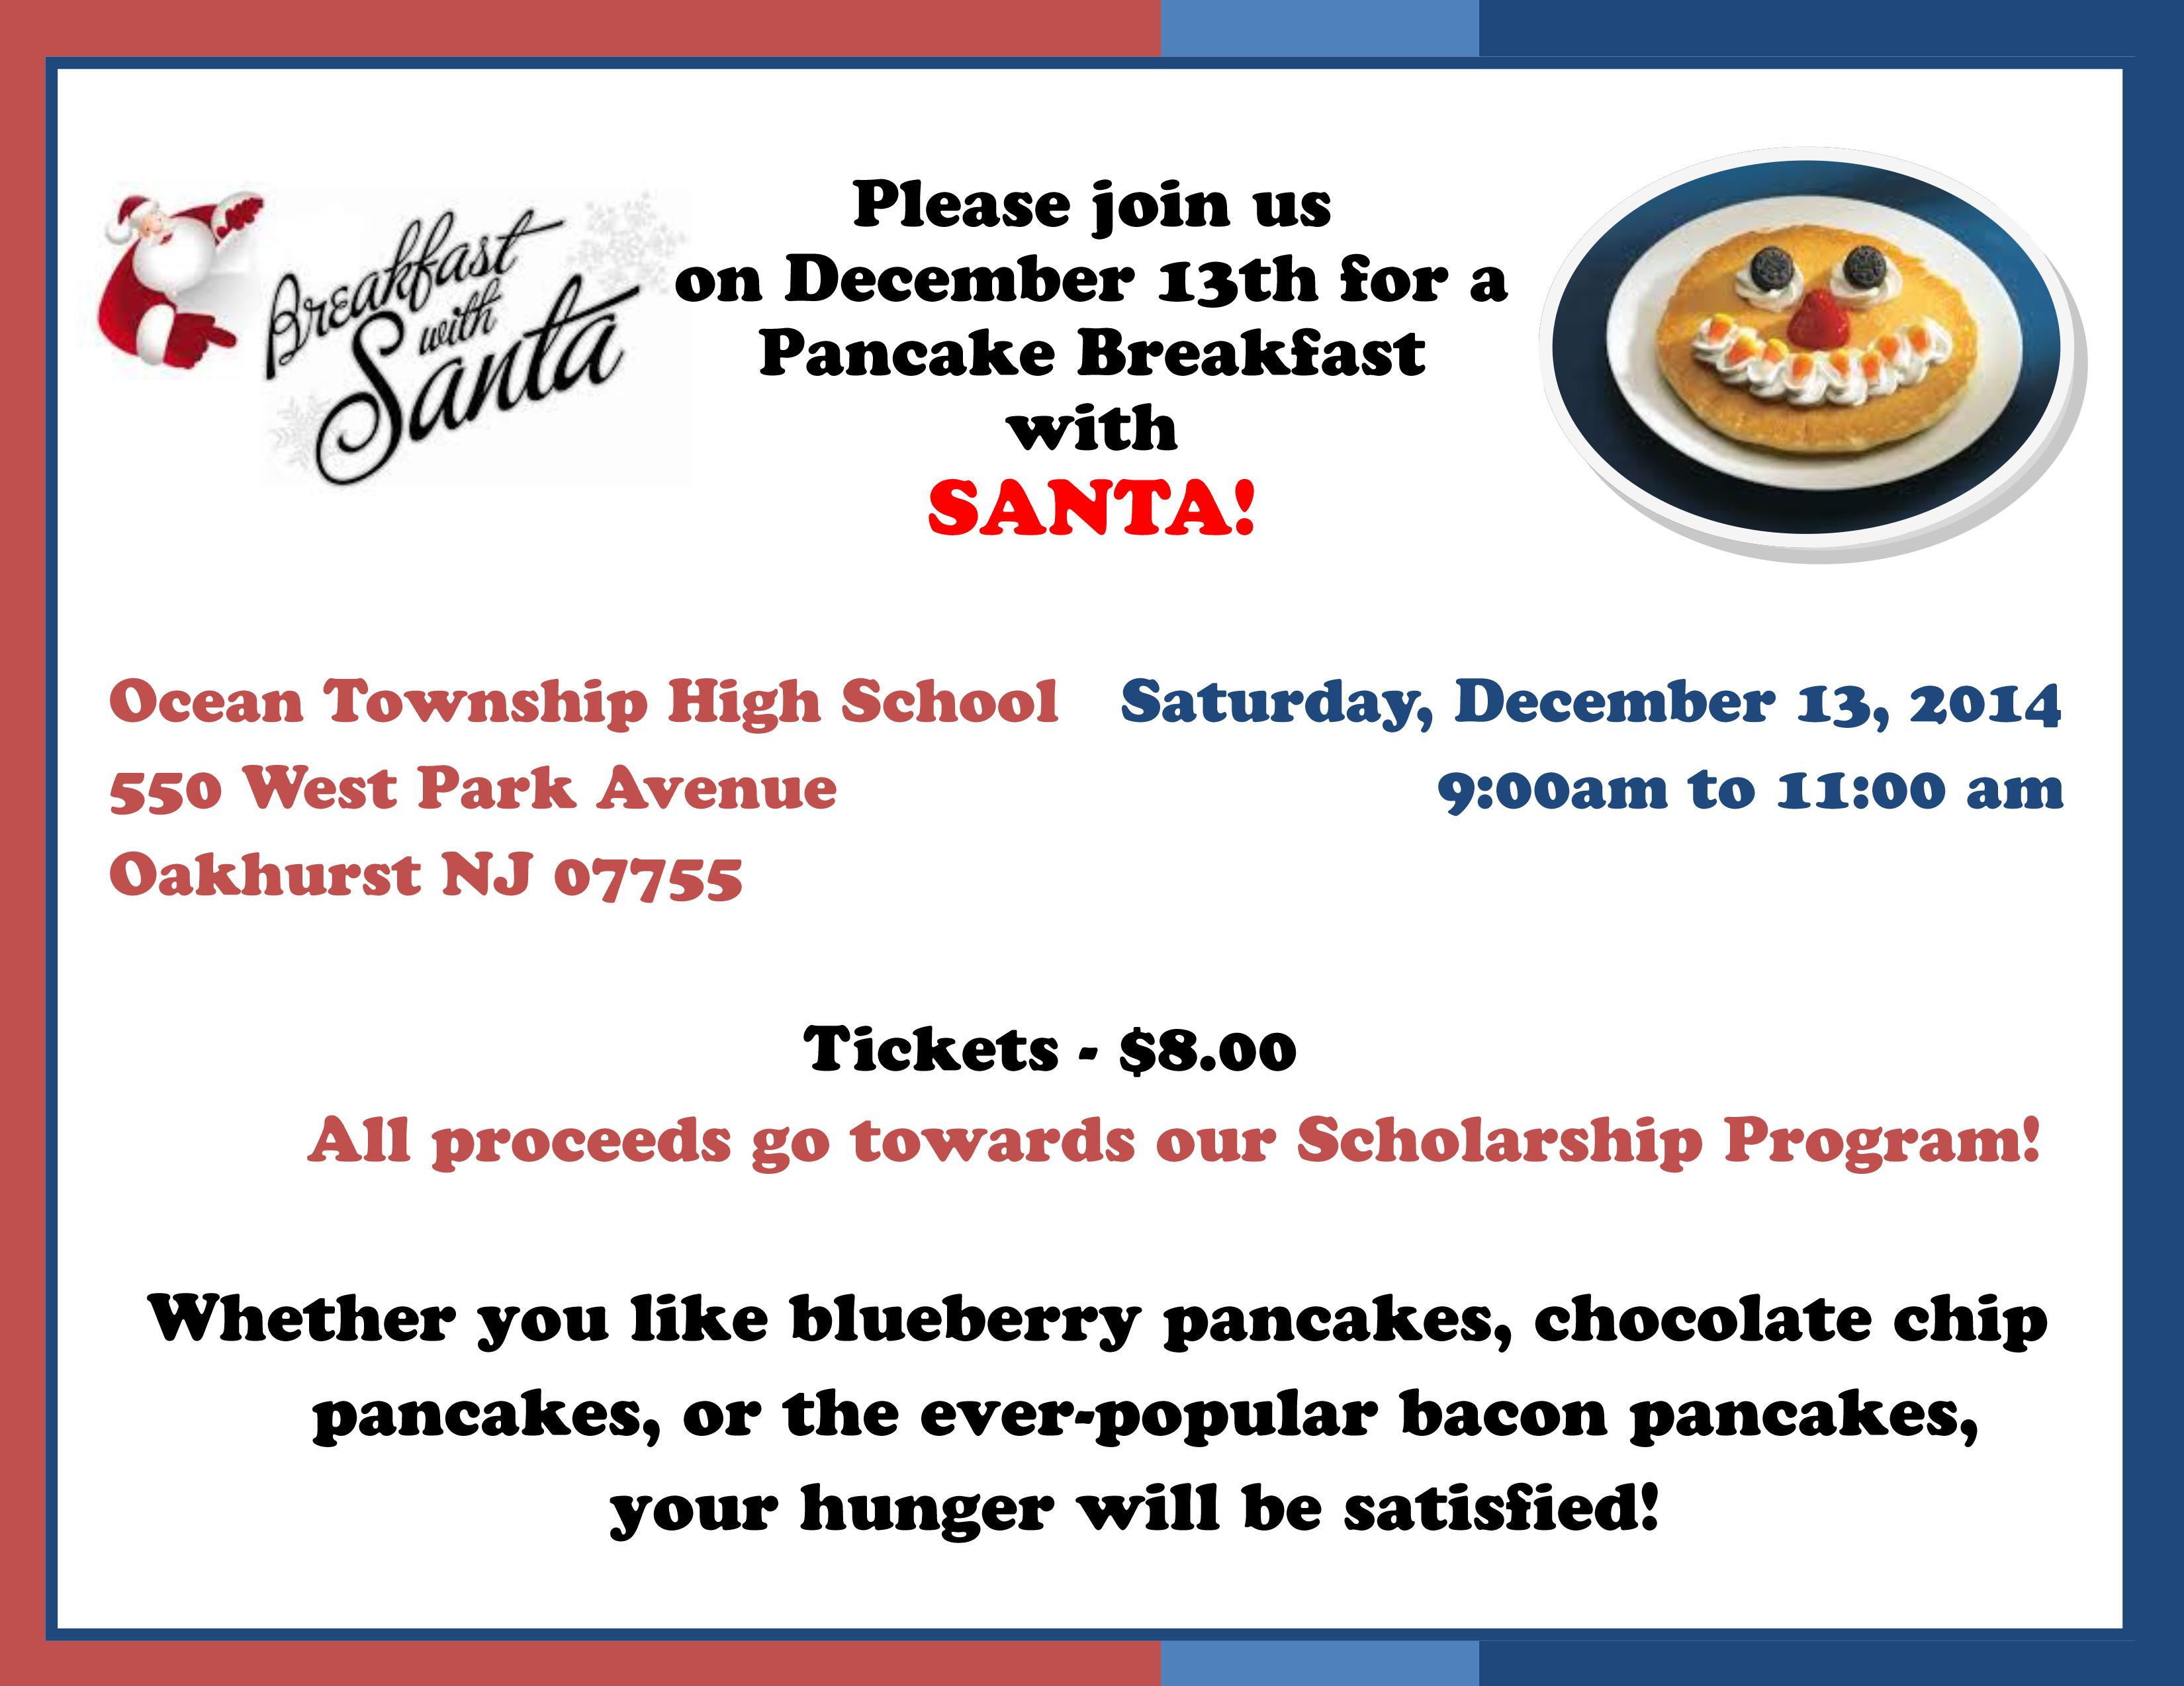 pancake_breakfast_with_santa_flyer (1)